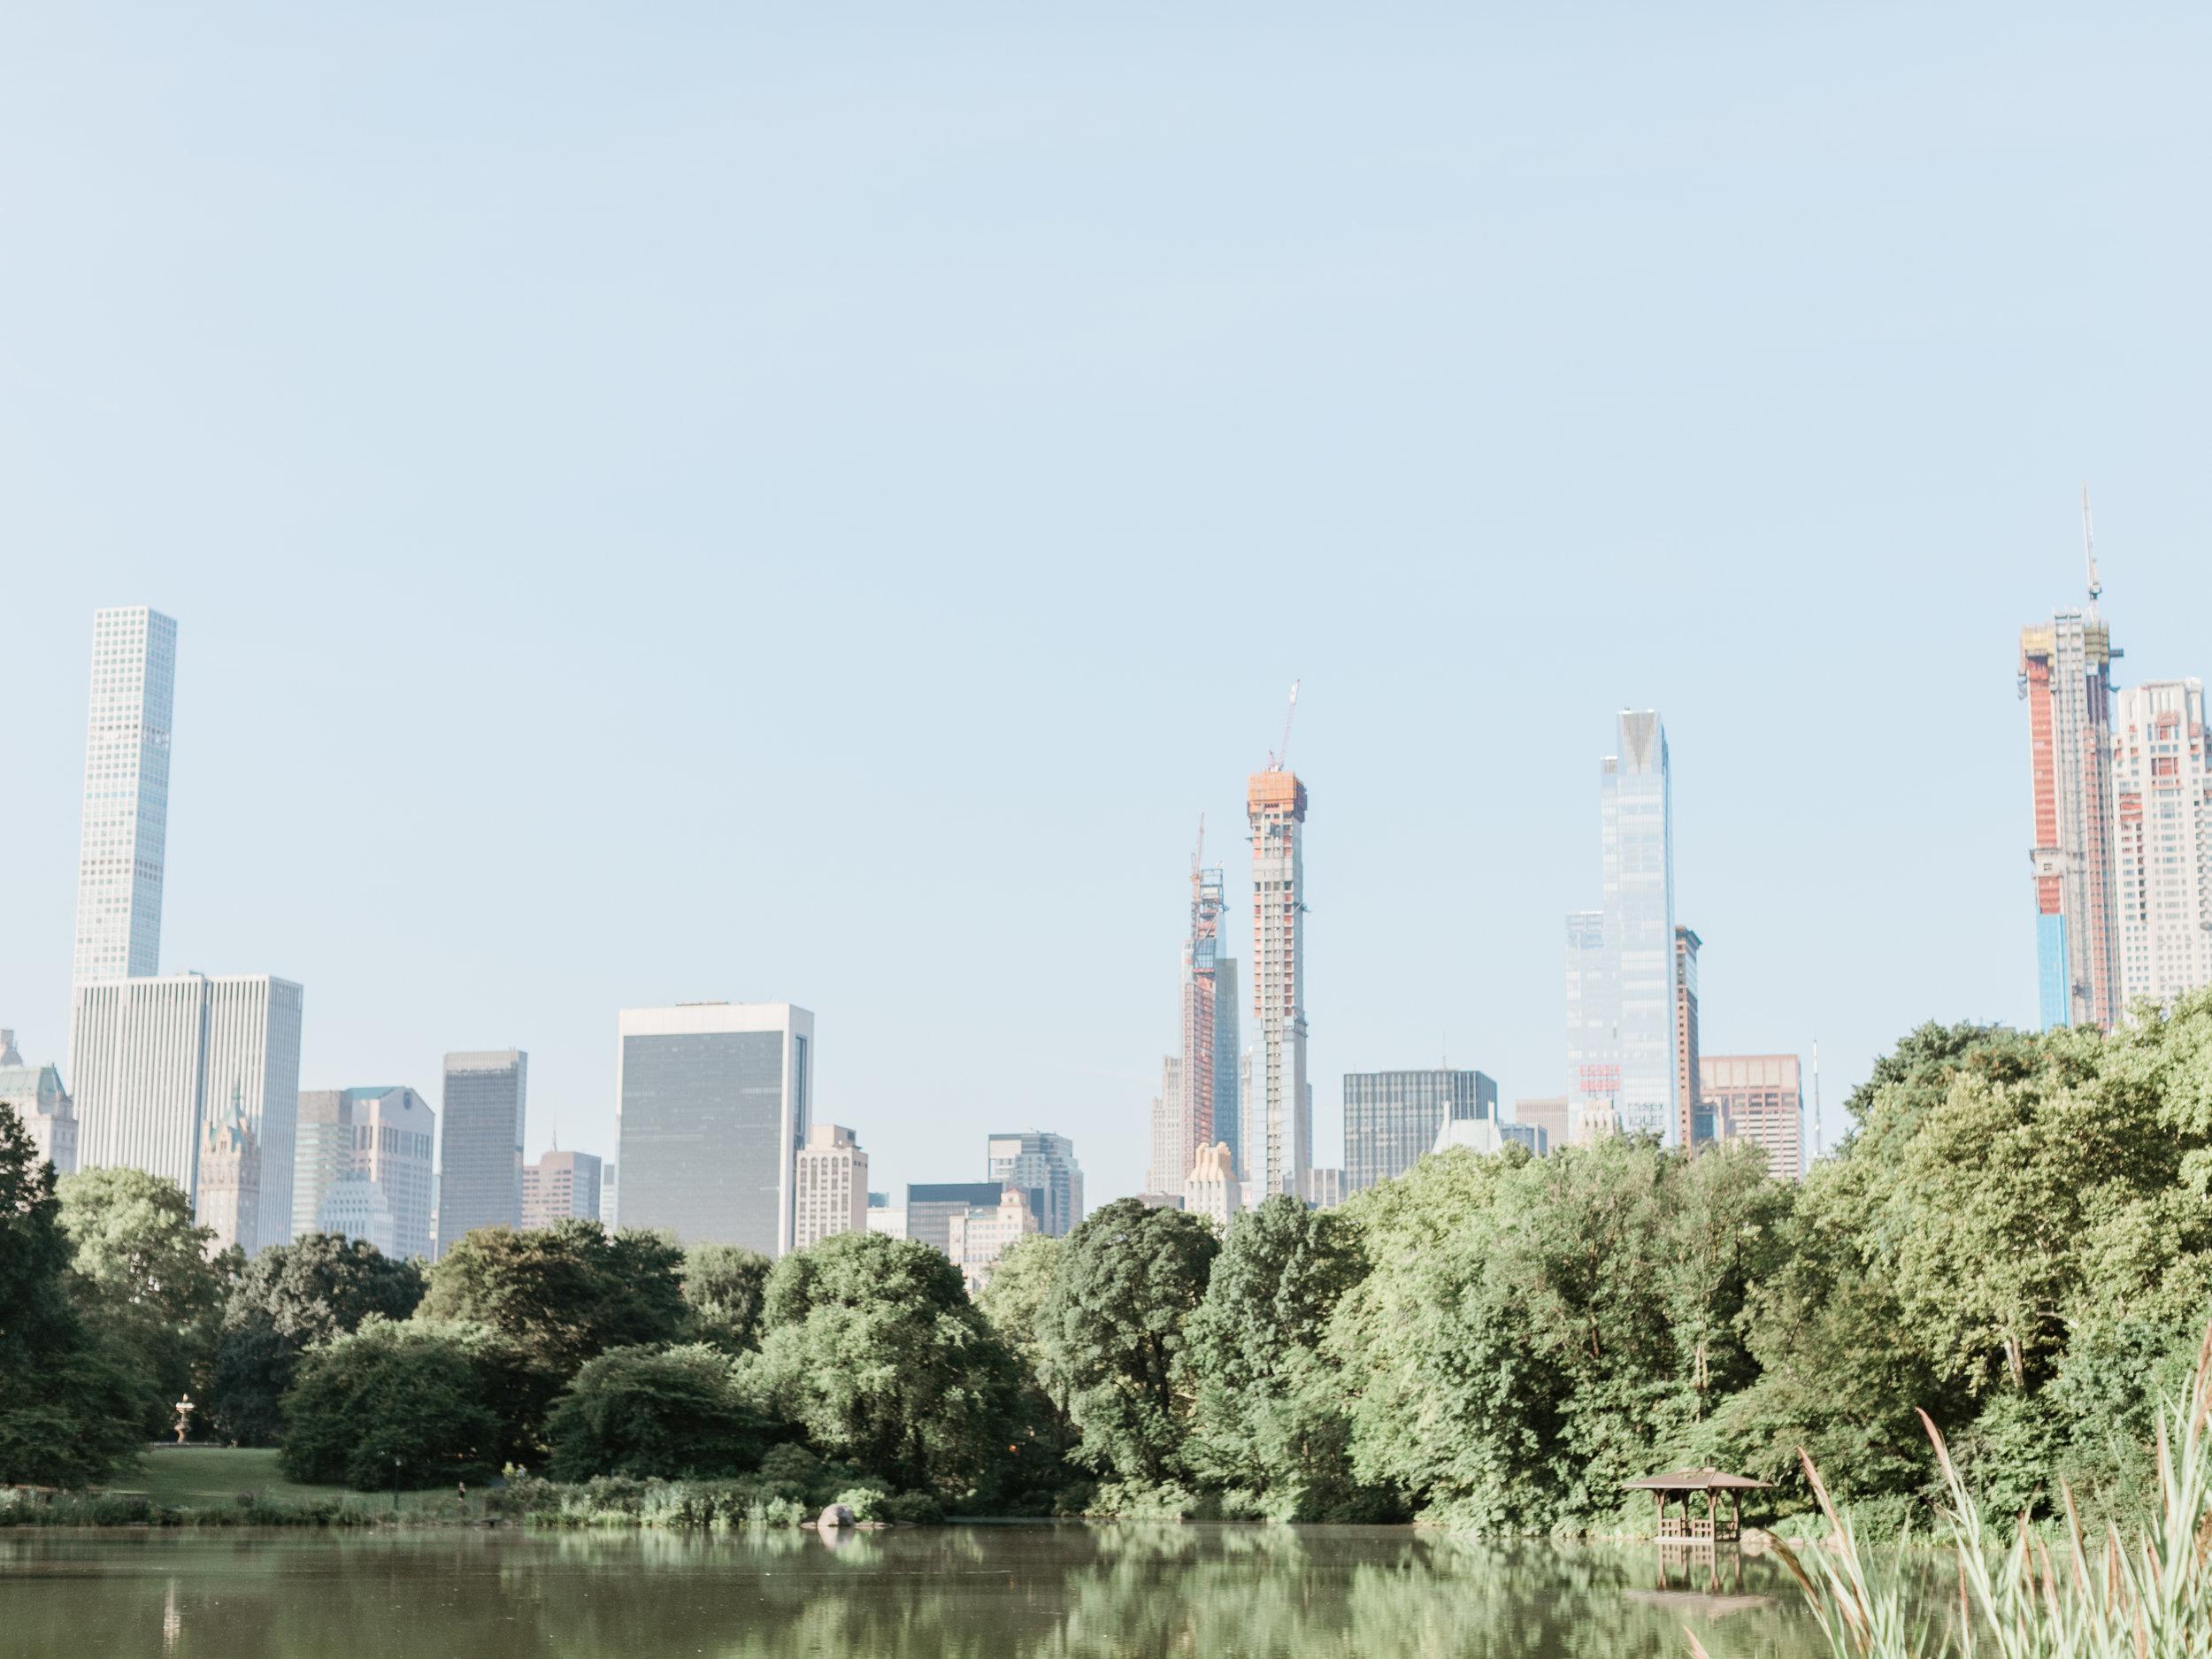 central-park-engagement-photography-asher-gardner34.jpg